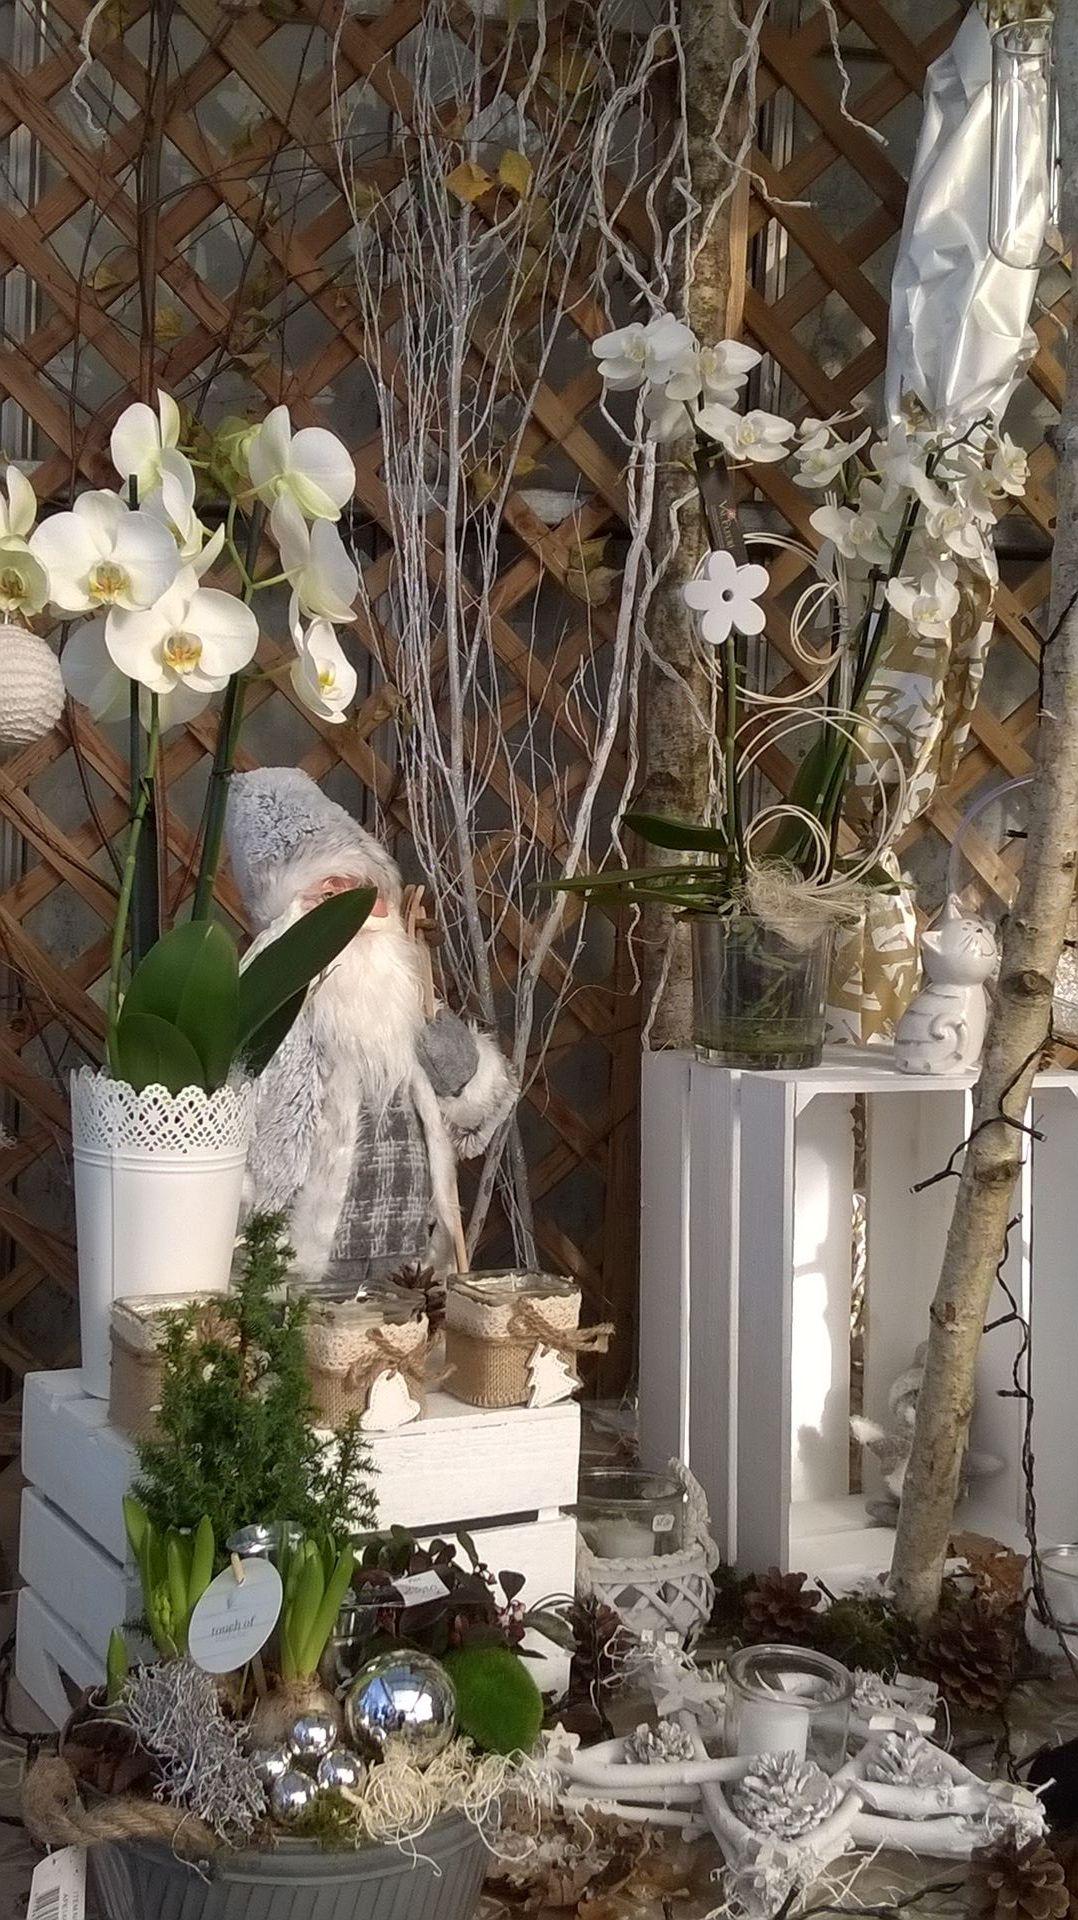 deco vitrine noel fleuriste rs08 jornalagora. Black Bedroom Furniture Sets. Home Design Ideas